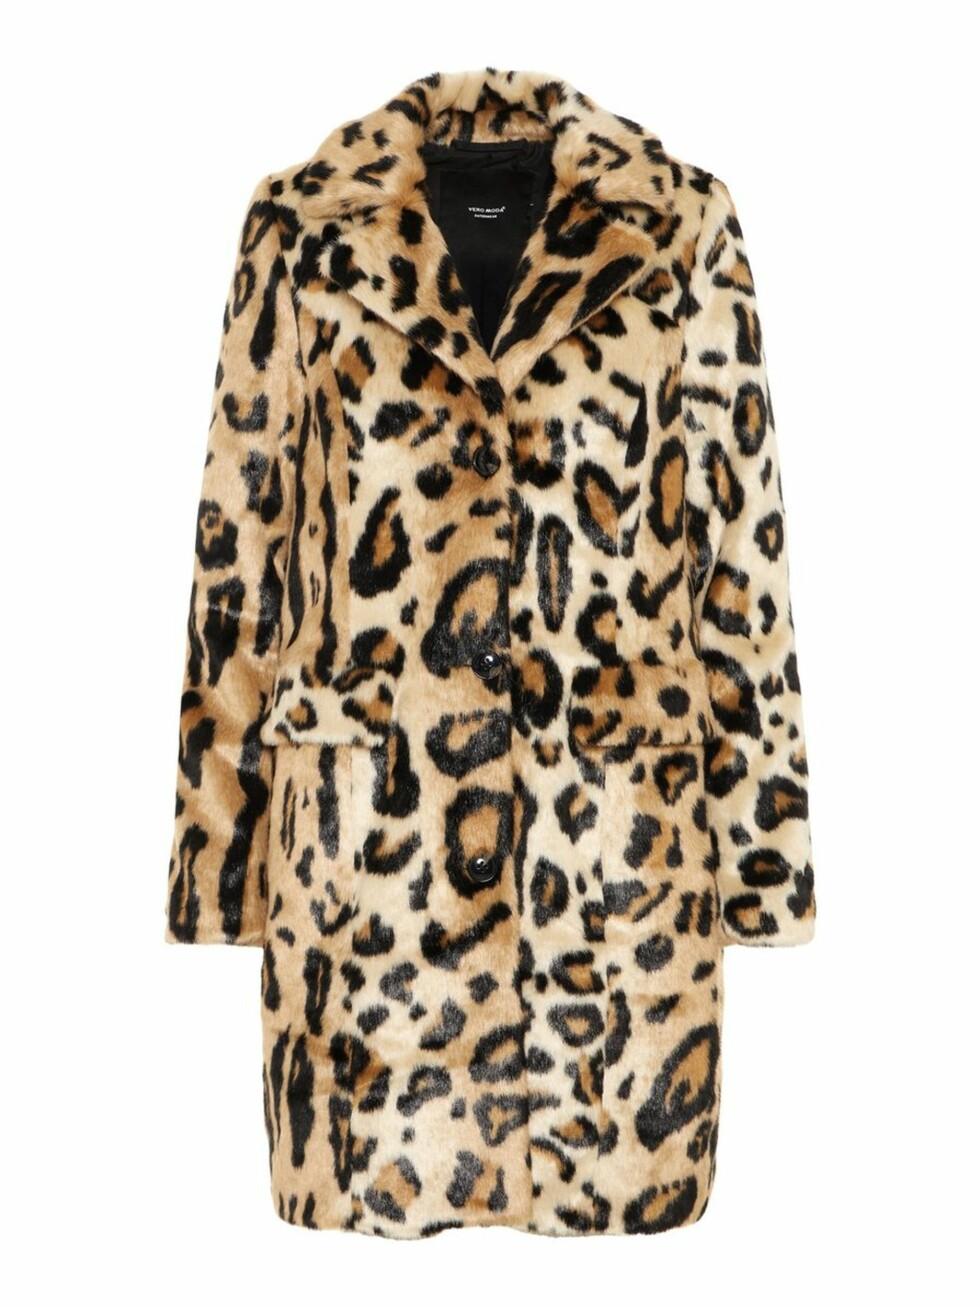 <strong>Kåpe fra Vero Moda  900,-  https:</strong>//www.veromoda.com/no/no/vm/kjoep-etter-kategori/jakker/leopard-kape-10202127.html?cgid=vm-jackets&dwvar_colorPattern=10202127_SilverMink_650481